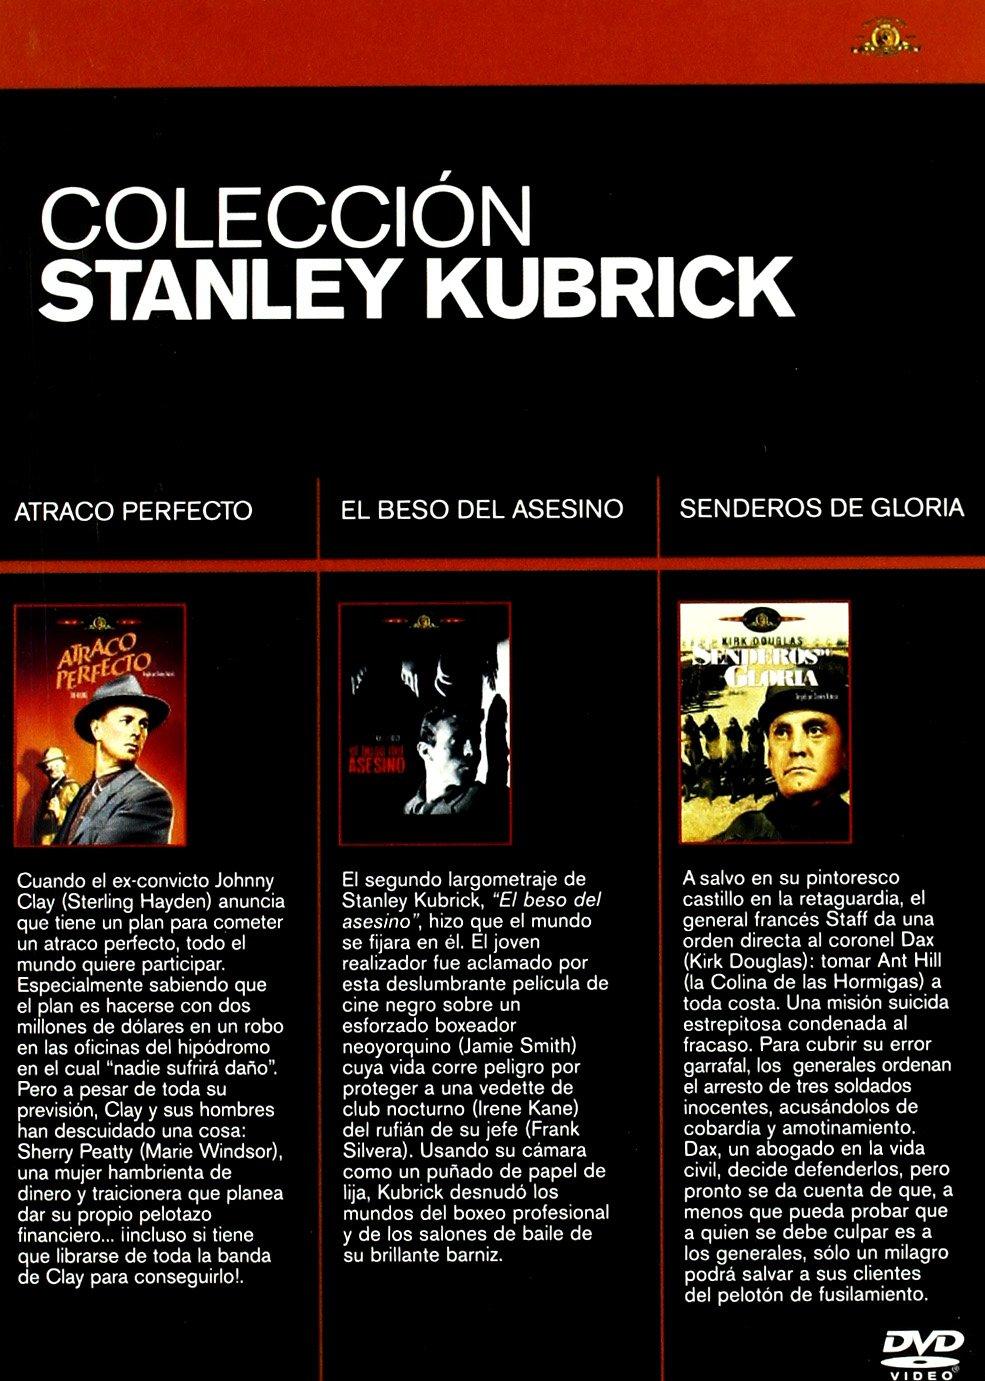 Stanley Kubrick - Bxs 3 Titulos [DVD]: Amazon.es: Frank Silvera, Jamie Smith, Irene Kane, Jerry Jarret, Mike Dana, Felice Orlandi, Shaun OBrien, Barbara Brand, Skippy Adelman, Kirk Douglas, Ralph Meeker, Adolphe Menjou,